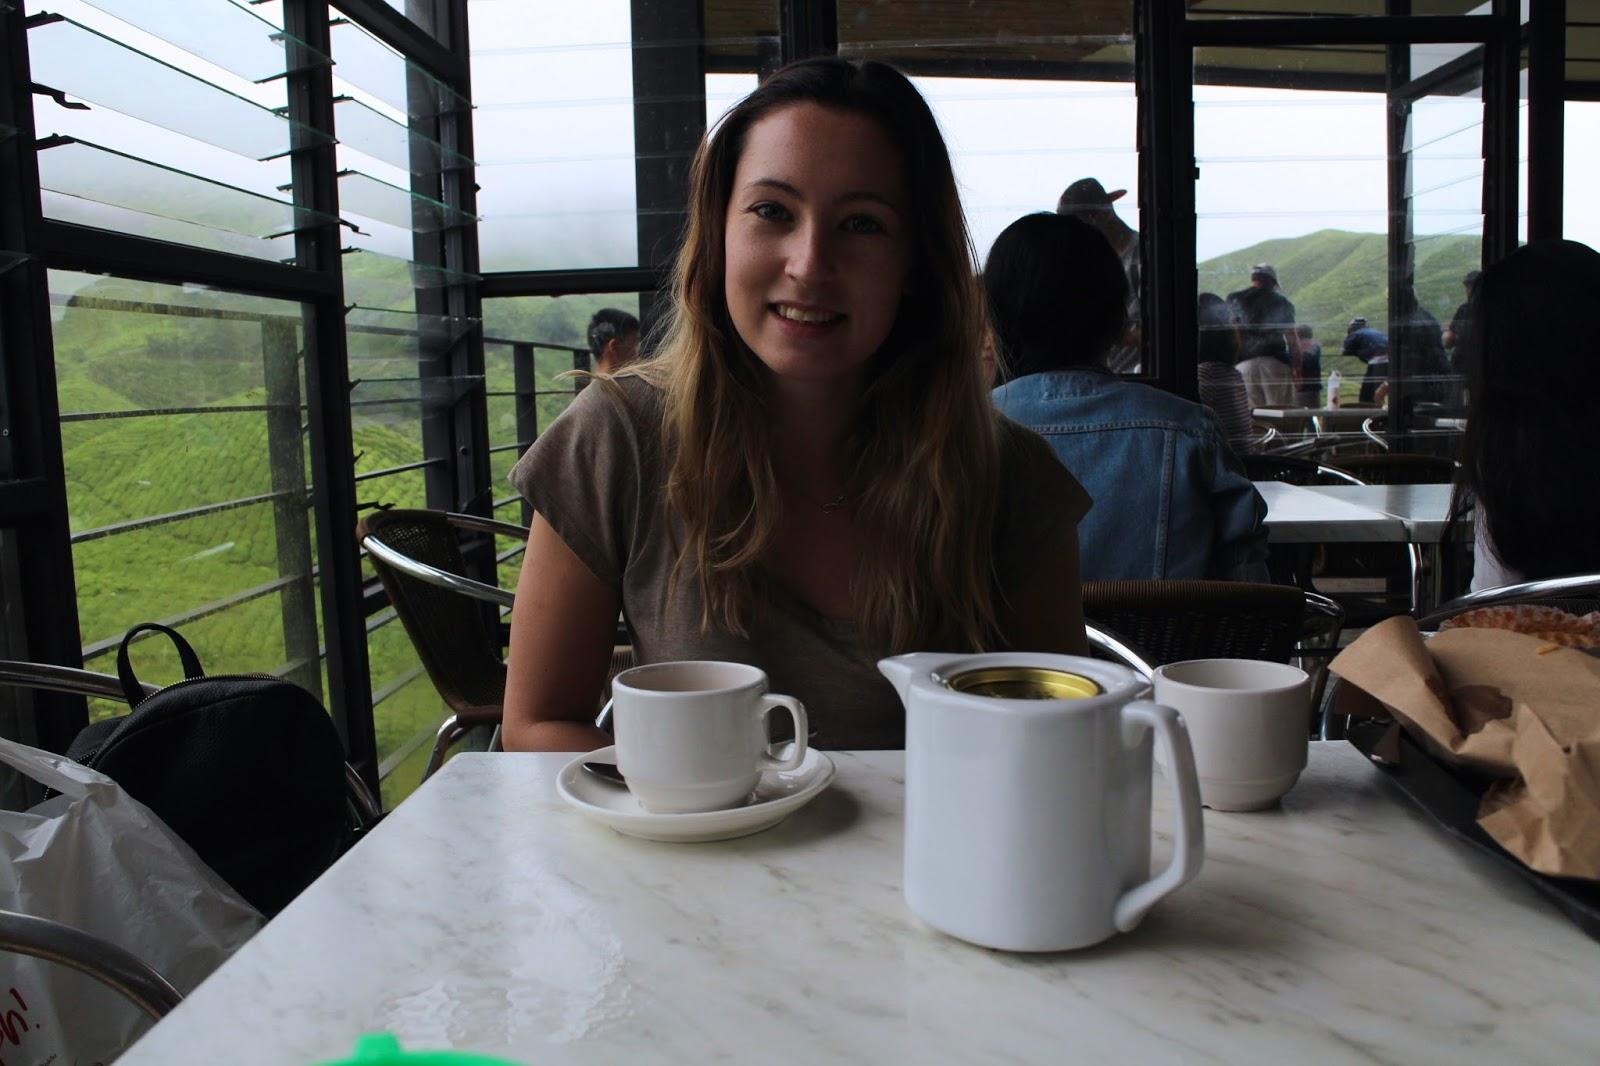 Having tea across the plantations